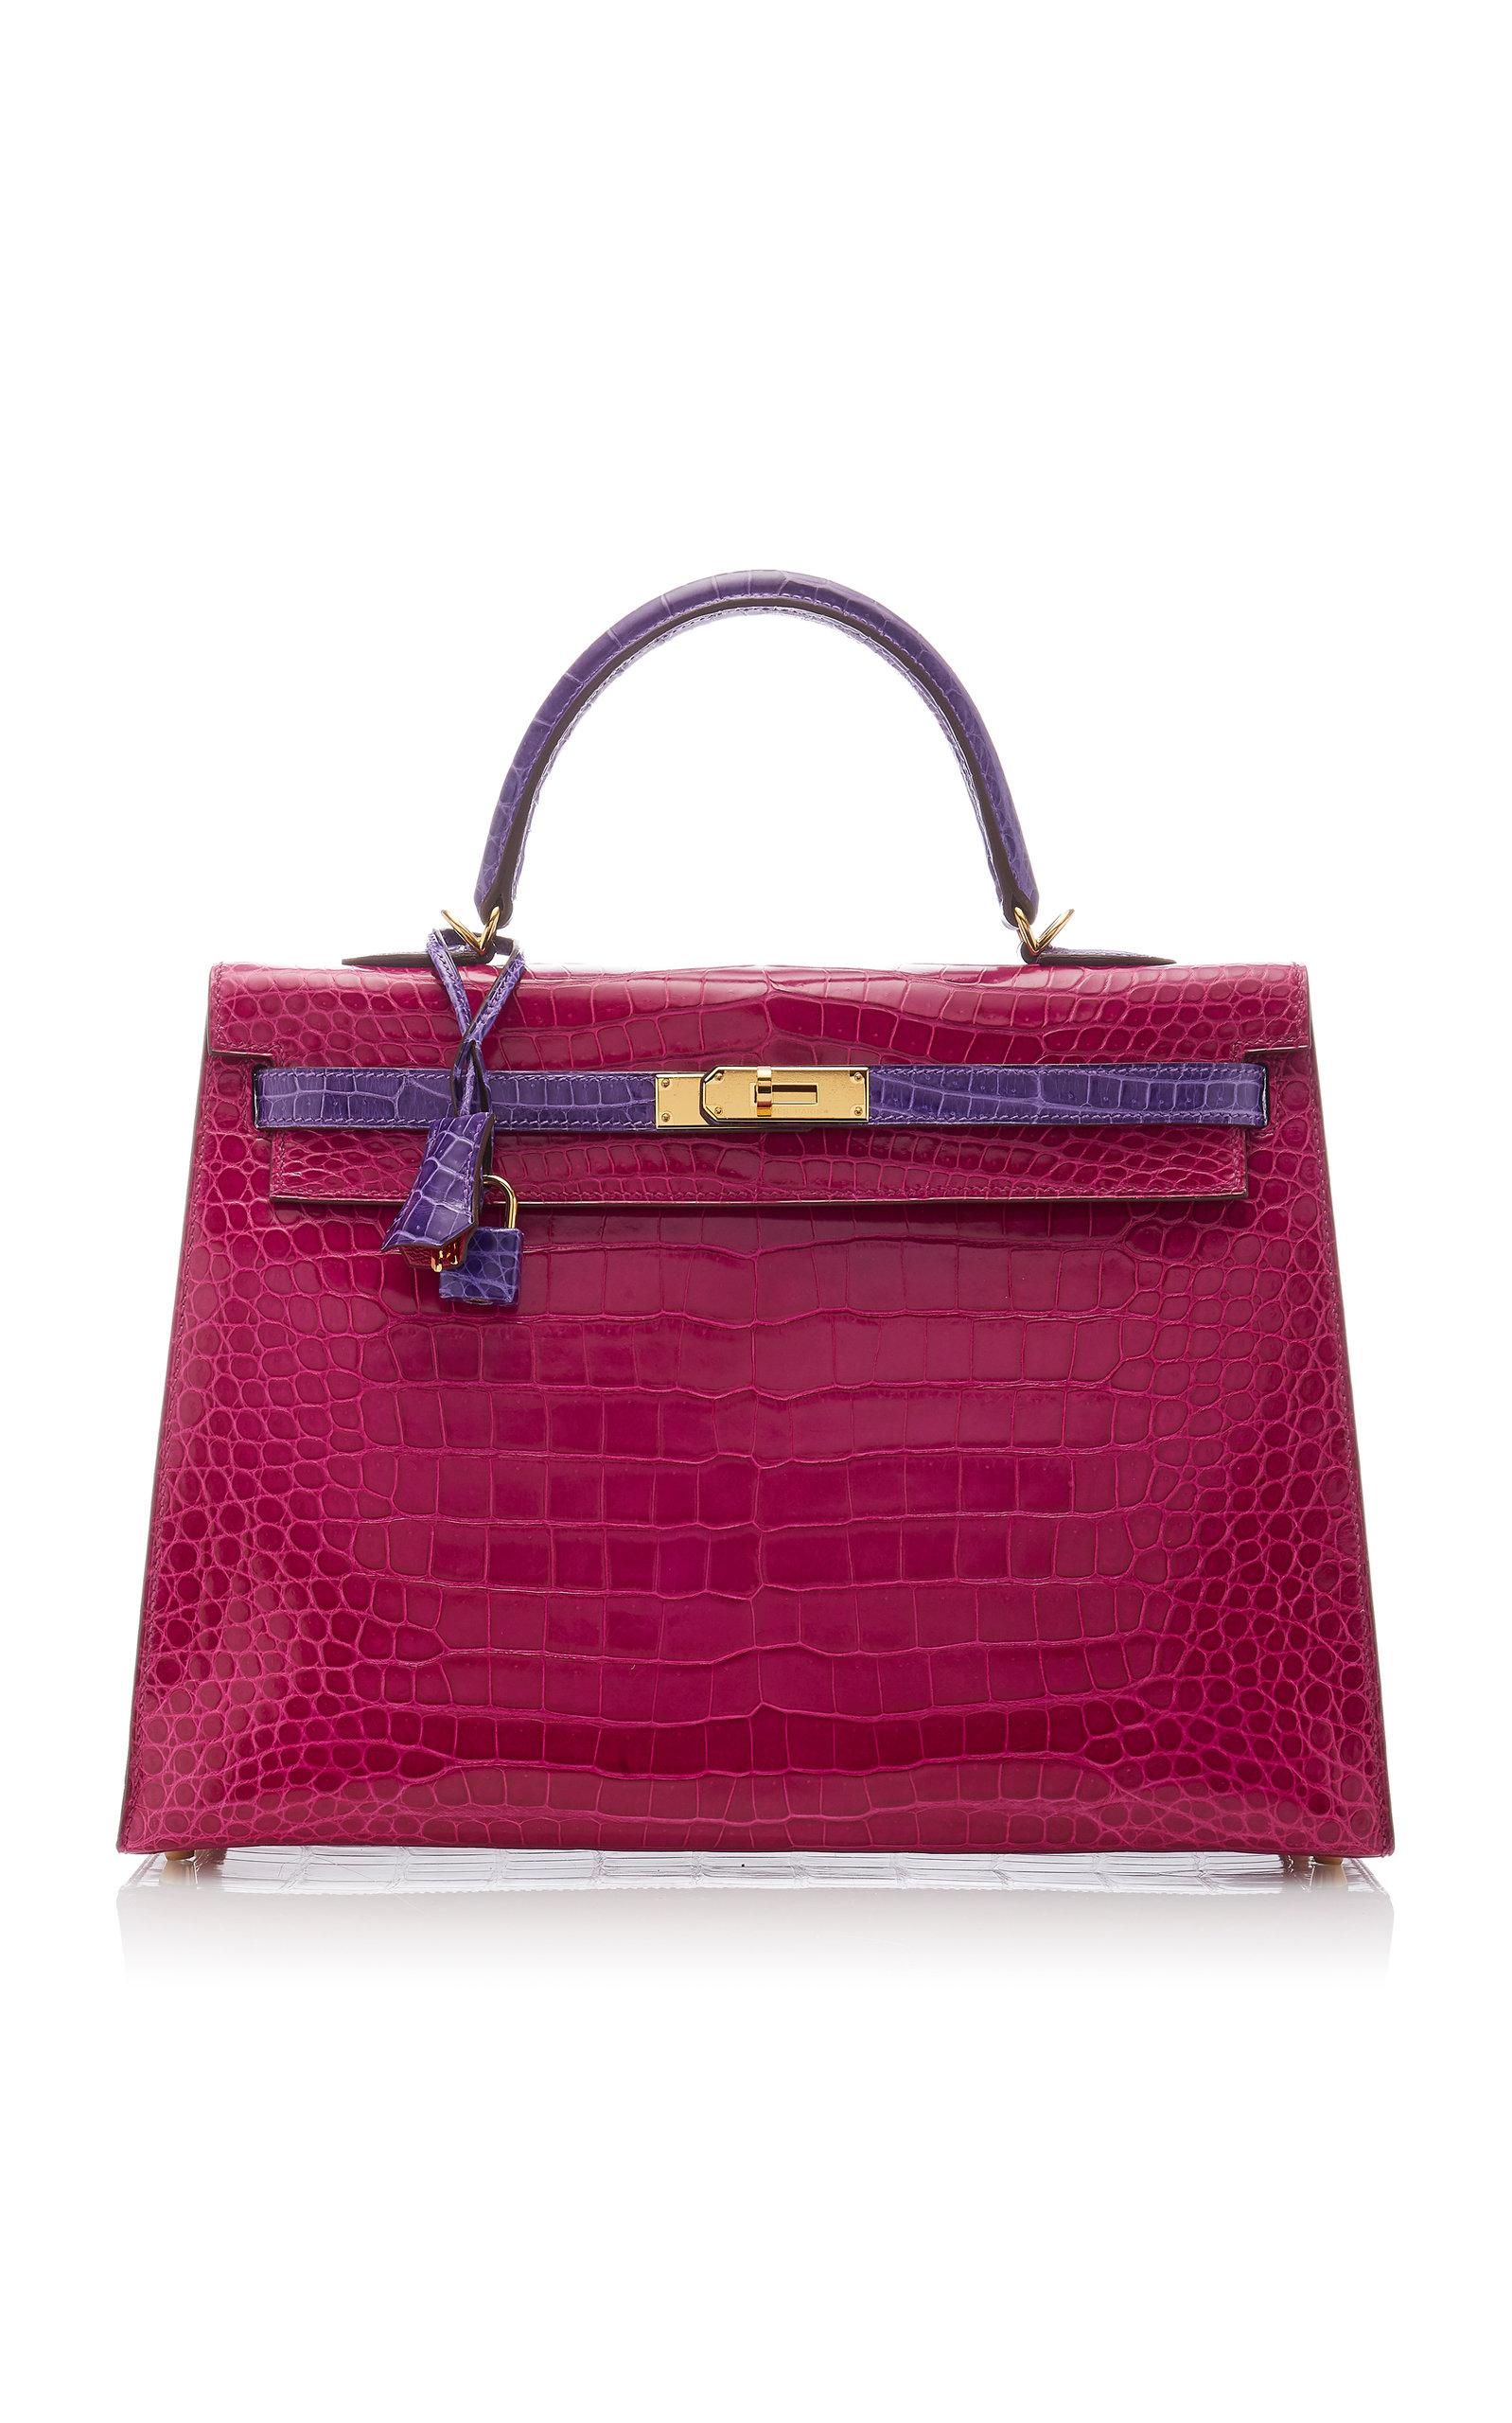 HermÈS Vintage By Heritage Auctions HermÈS 35Cm Rose Scheherazade And Violet Shiny Porosus Crocodile Kelly Bag In Pink